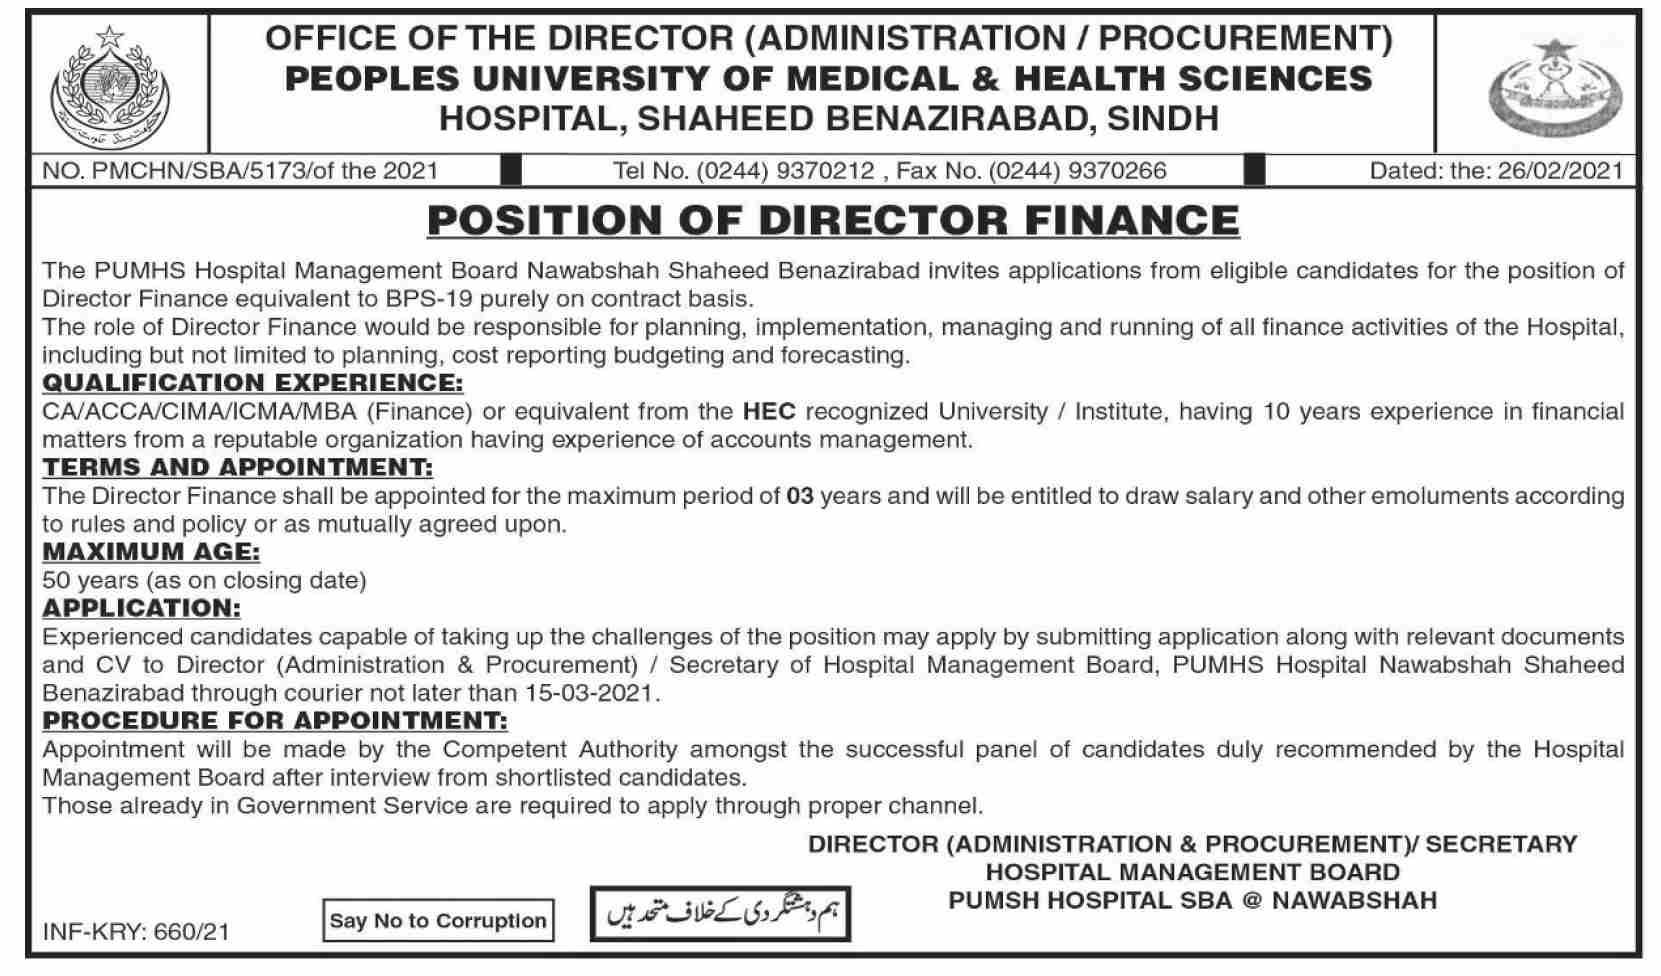 dawn-newspaper-latest-govt-private-jobs-today-in-pakistan-2-march-2021-nokristan.com